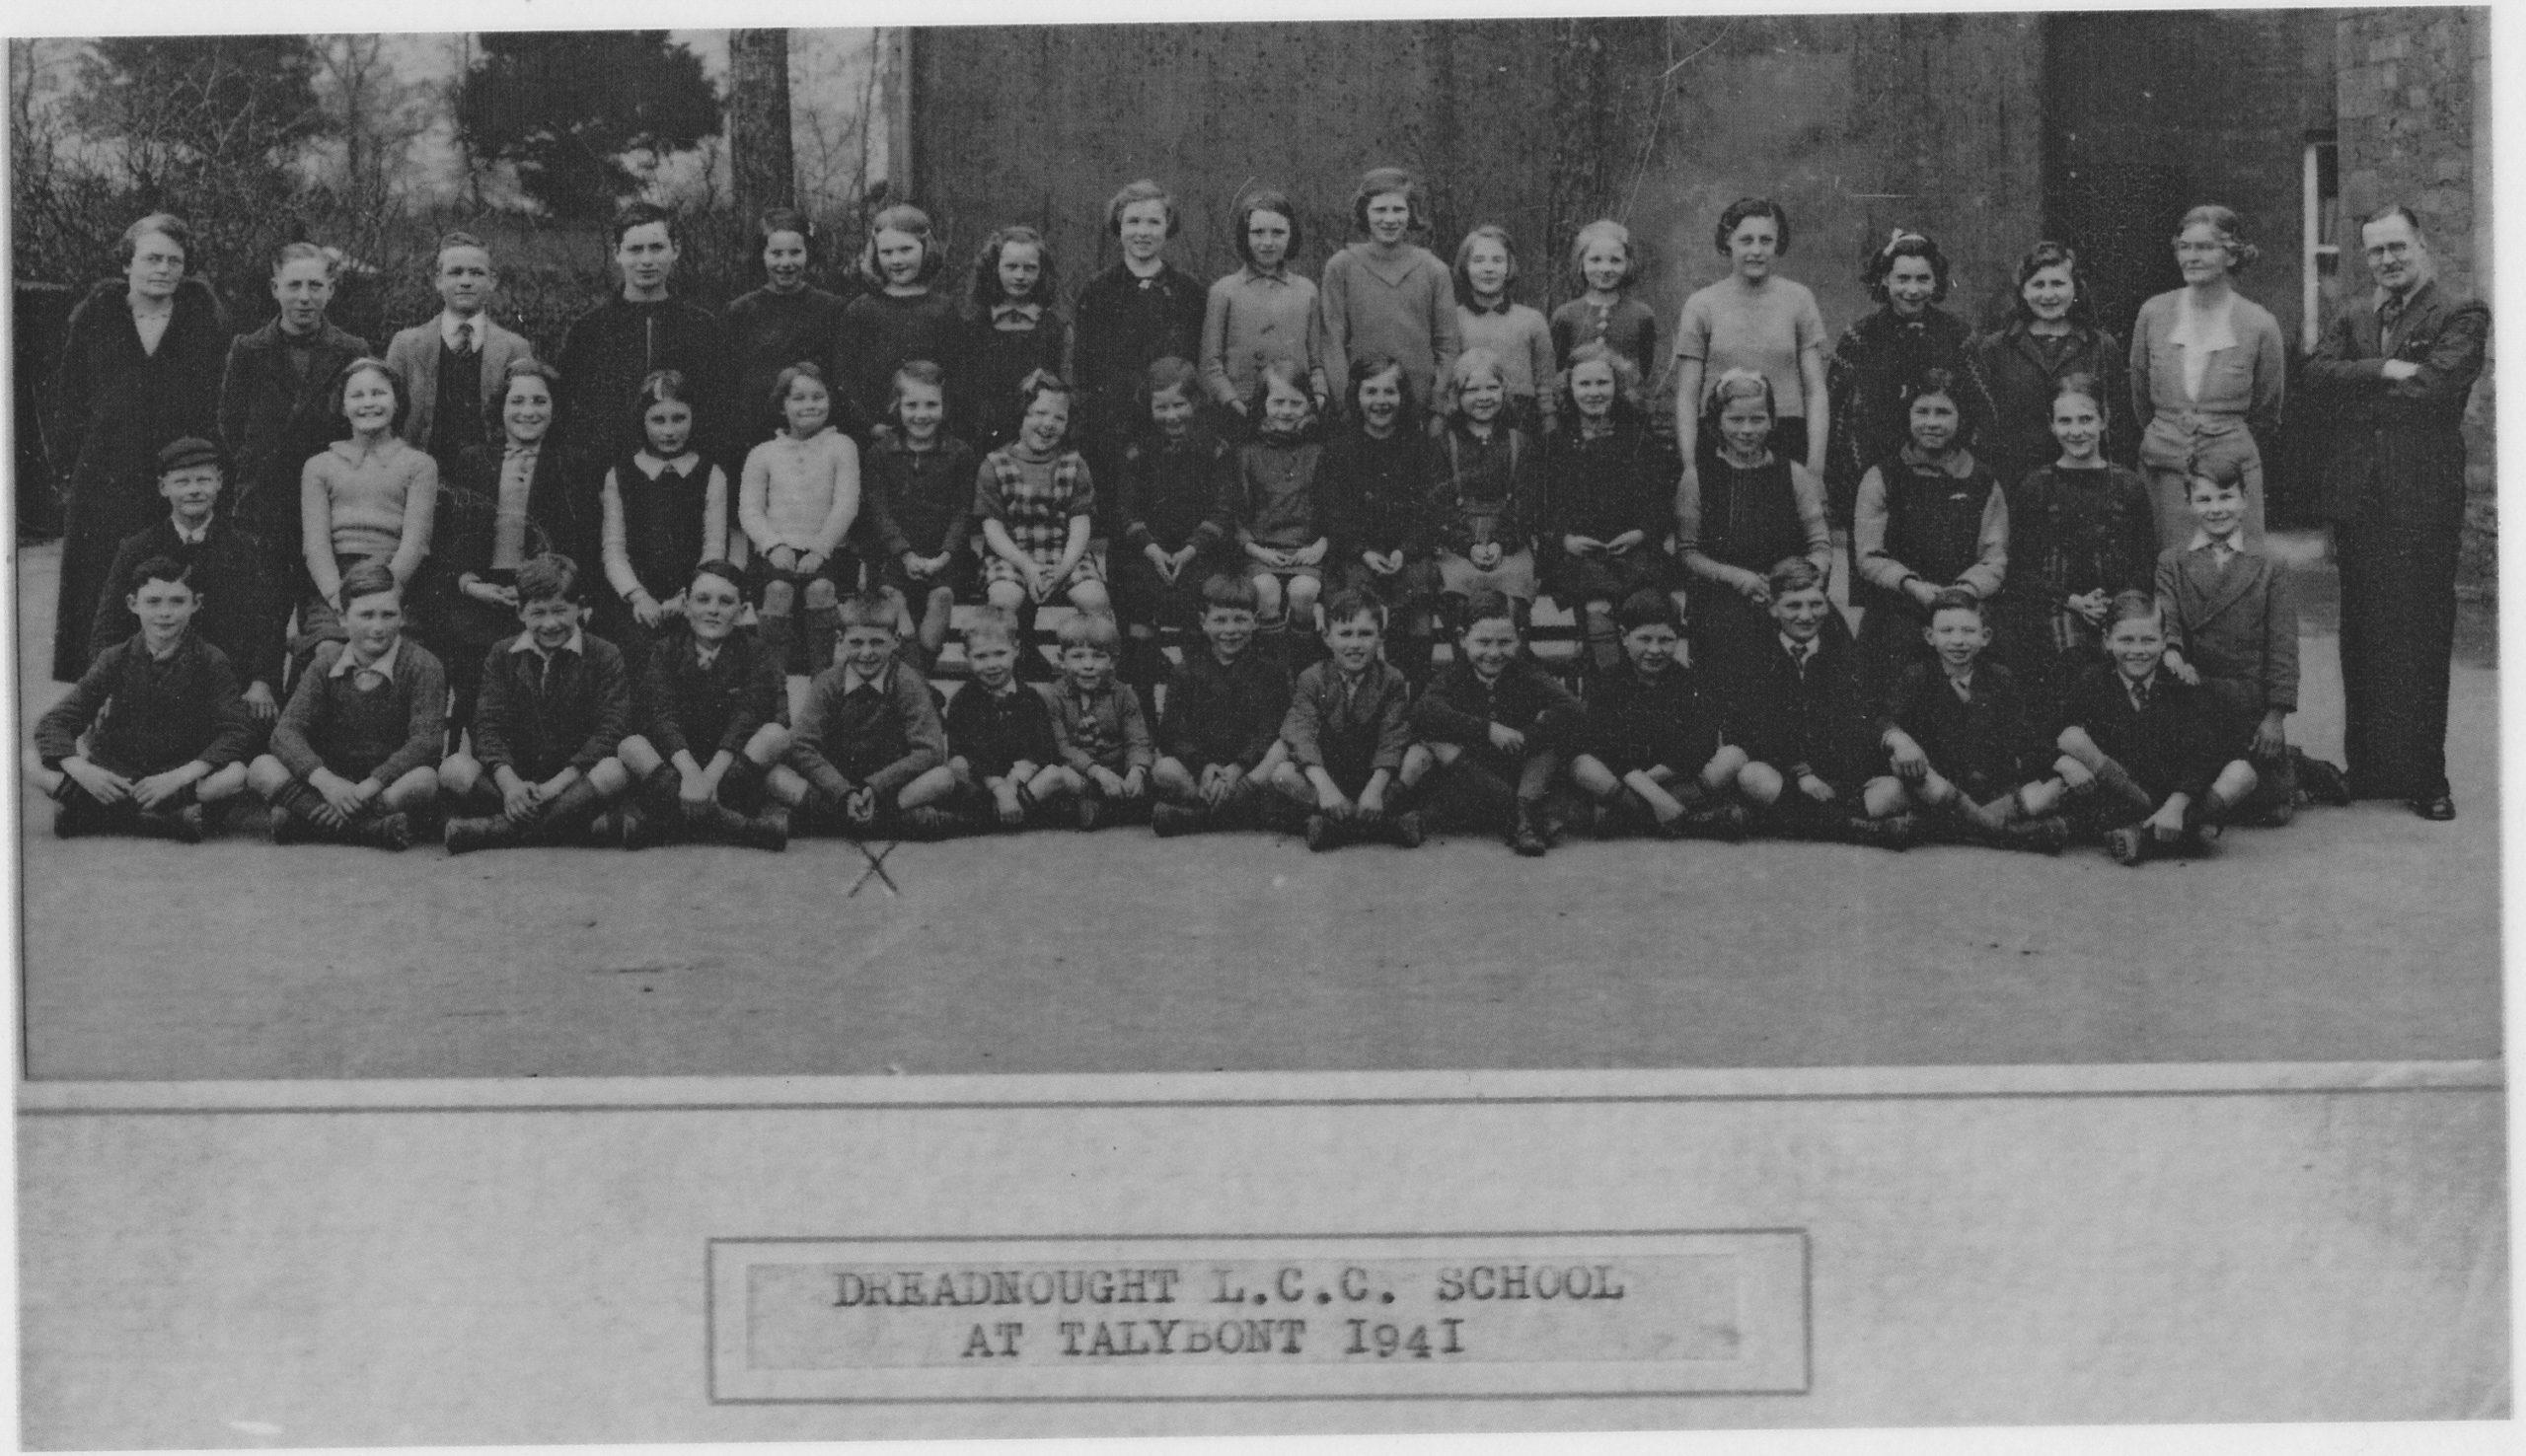 Dreadnought LCC School evacuees 1941